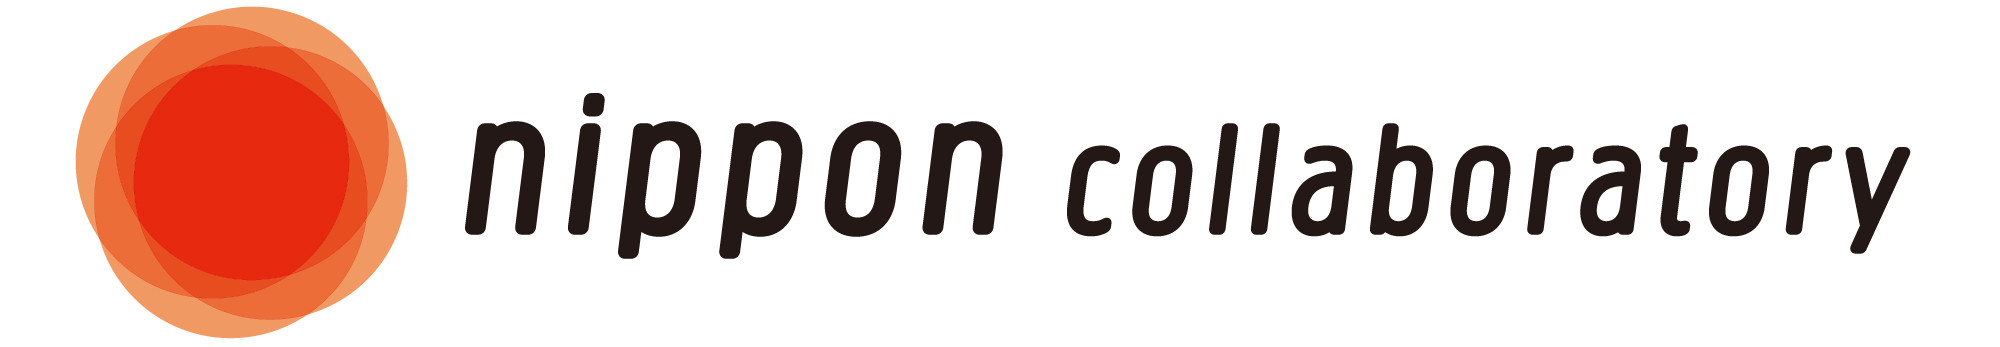 nippon collaboratory